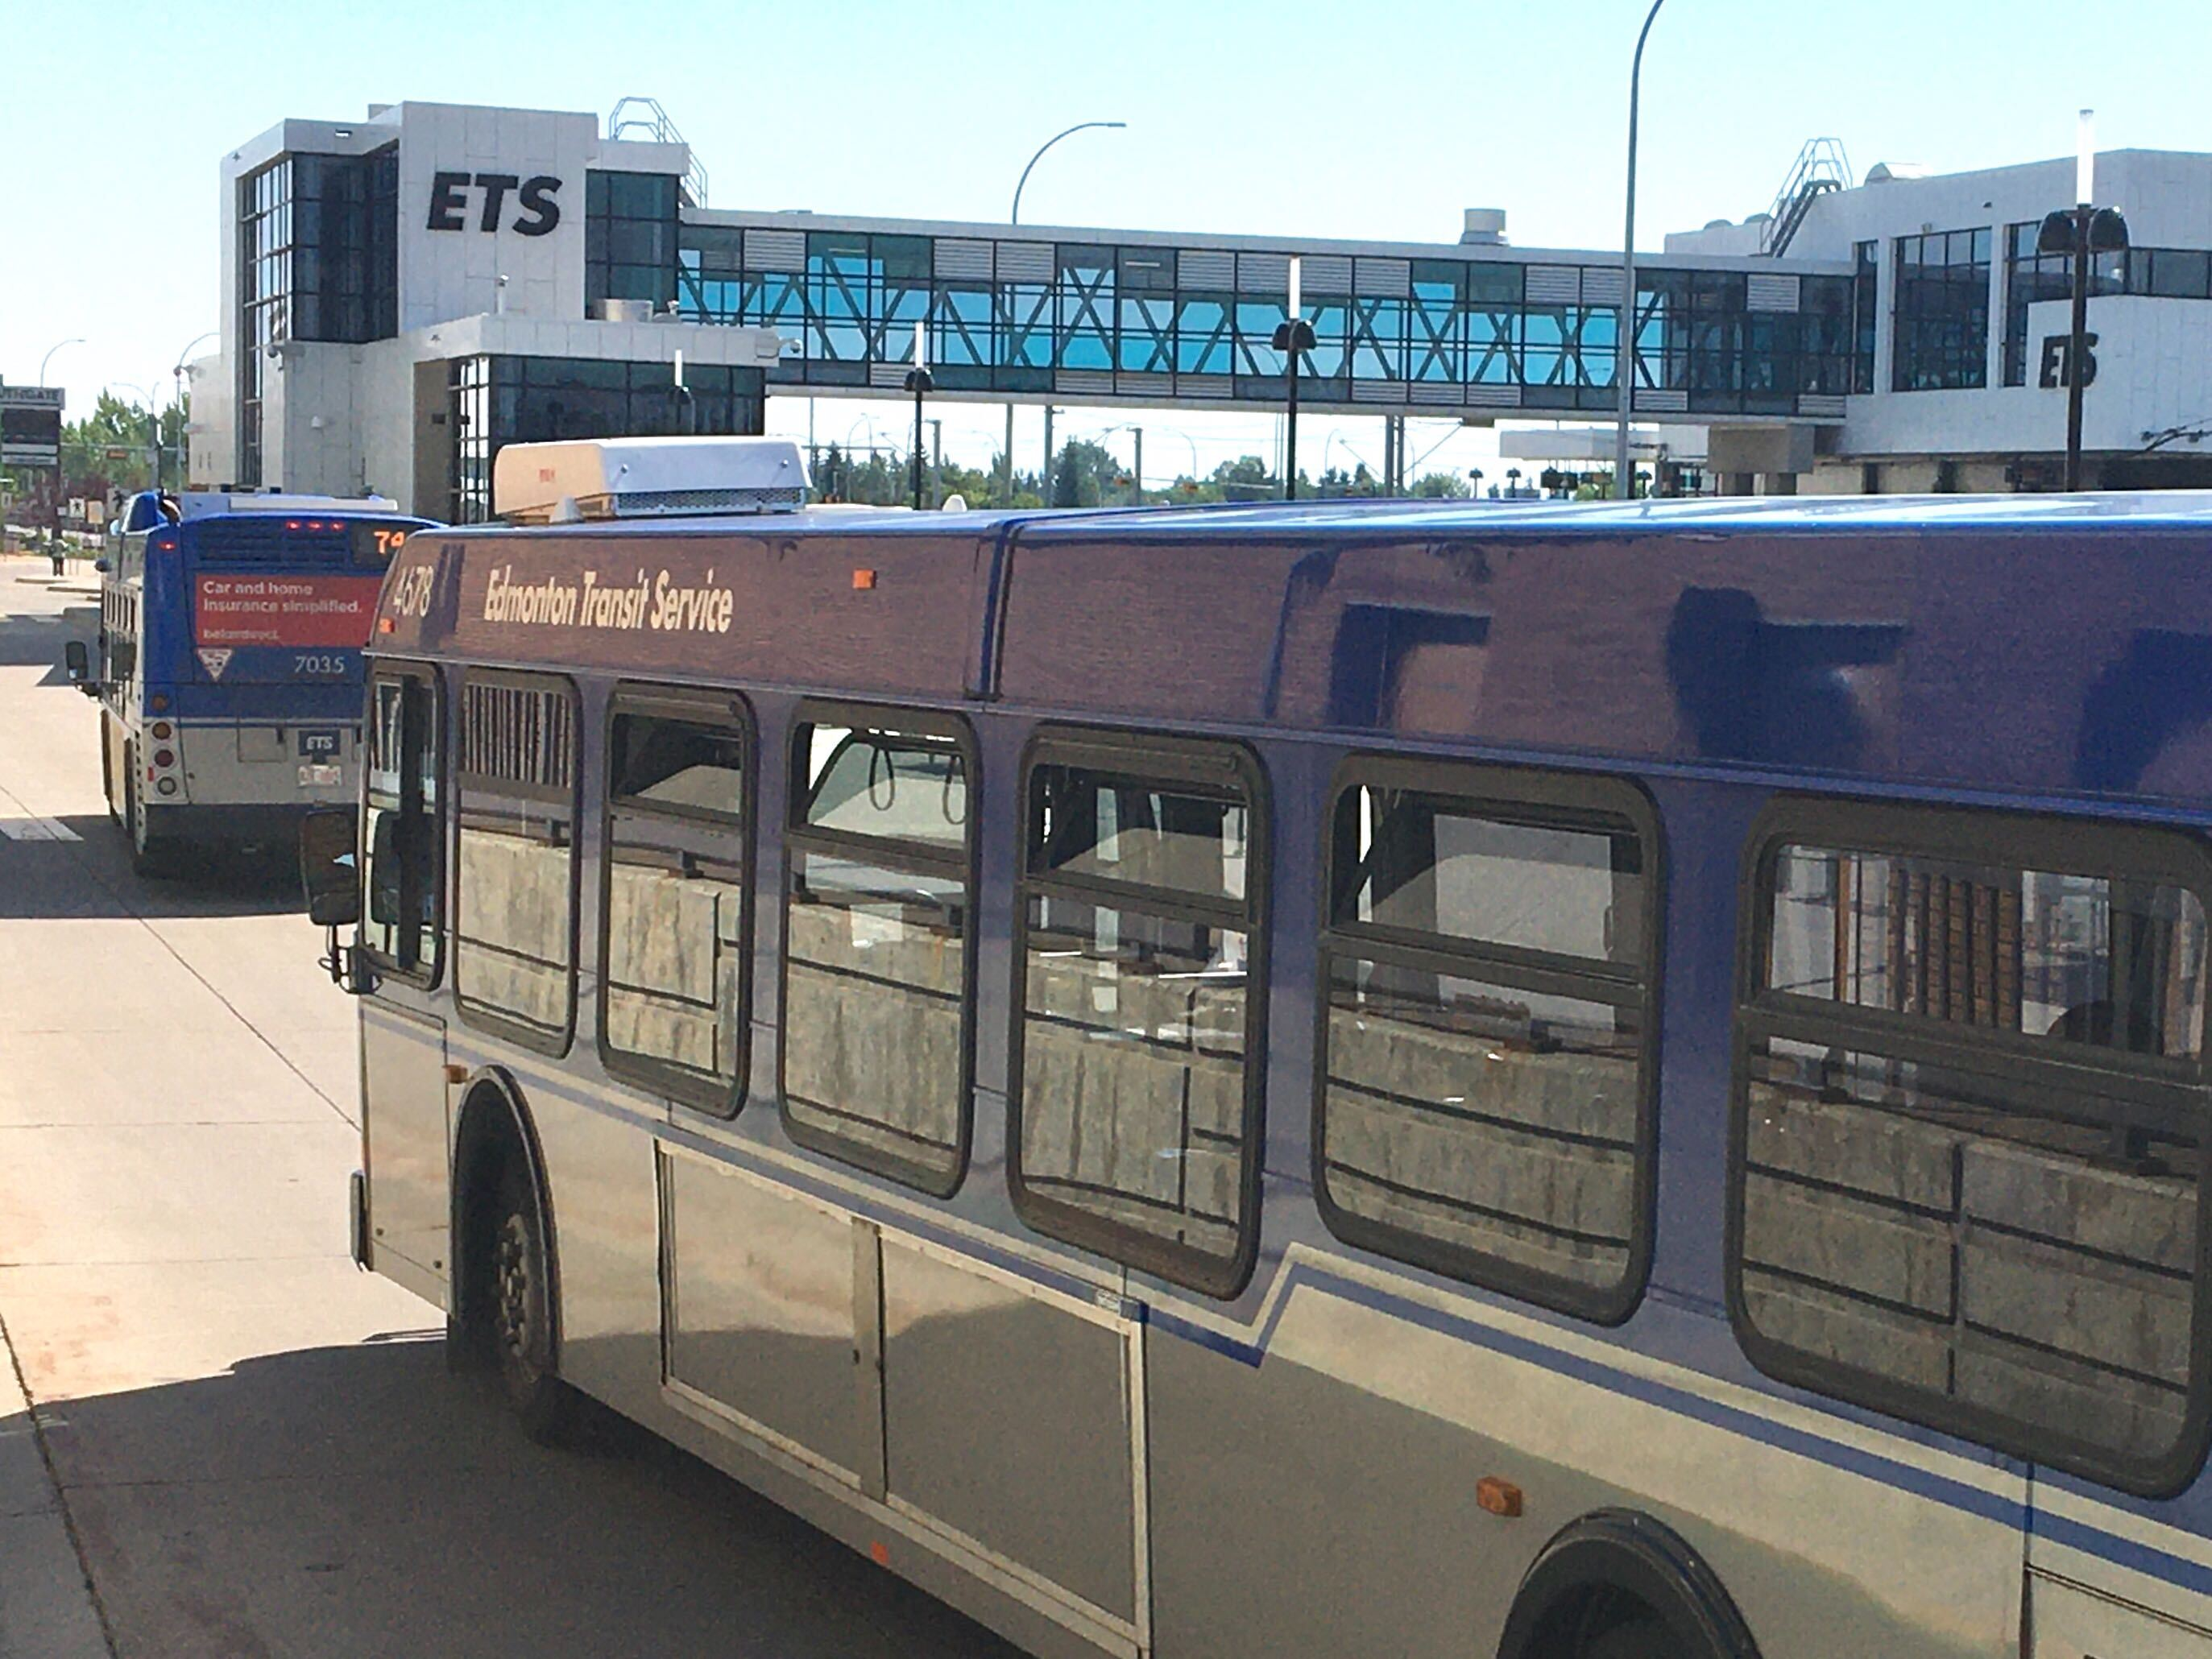 Edmonton Selects Companies To Run On Demand Transit For 2021 Pilot Project Edmonton Globalnews Ca